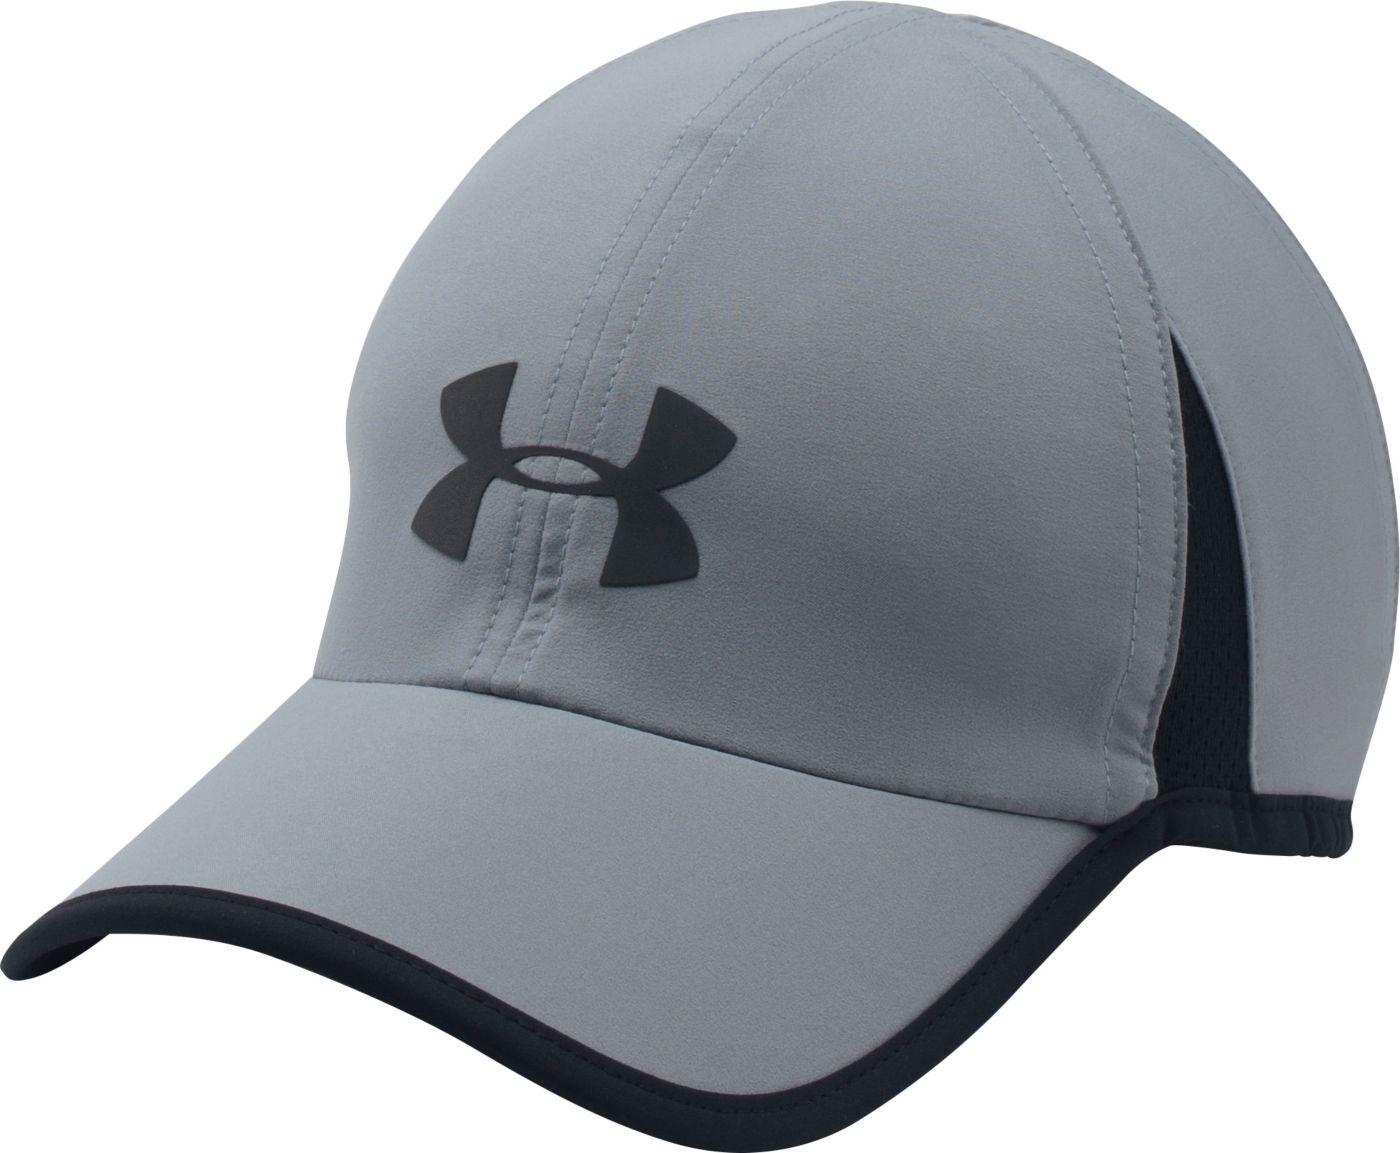 Under Armour Men's Shadow Hat 4.0